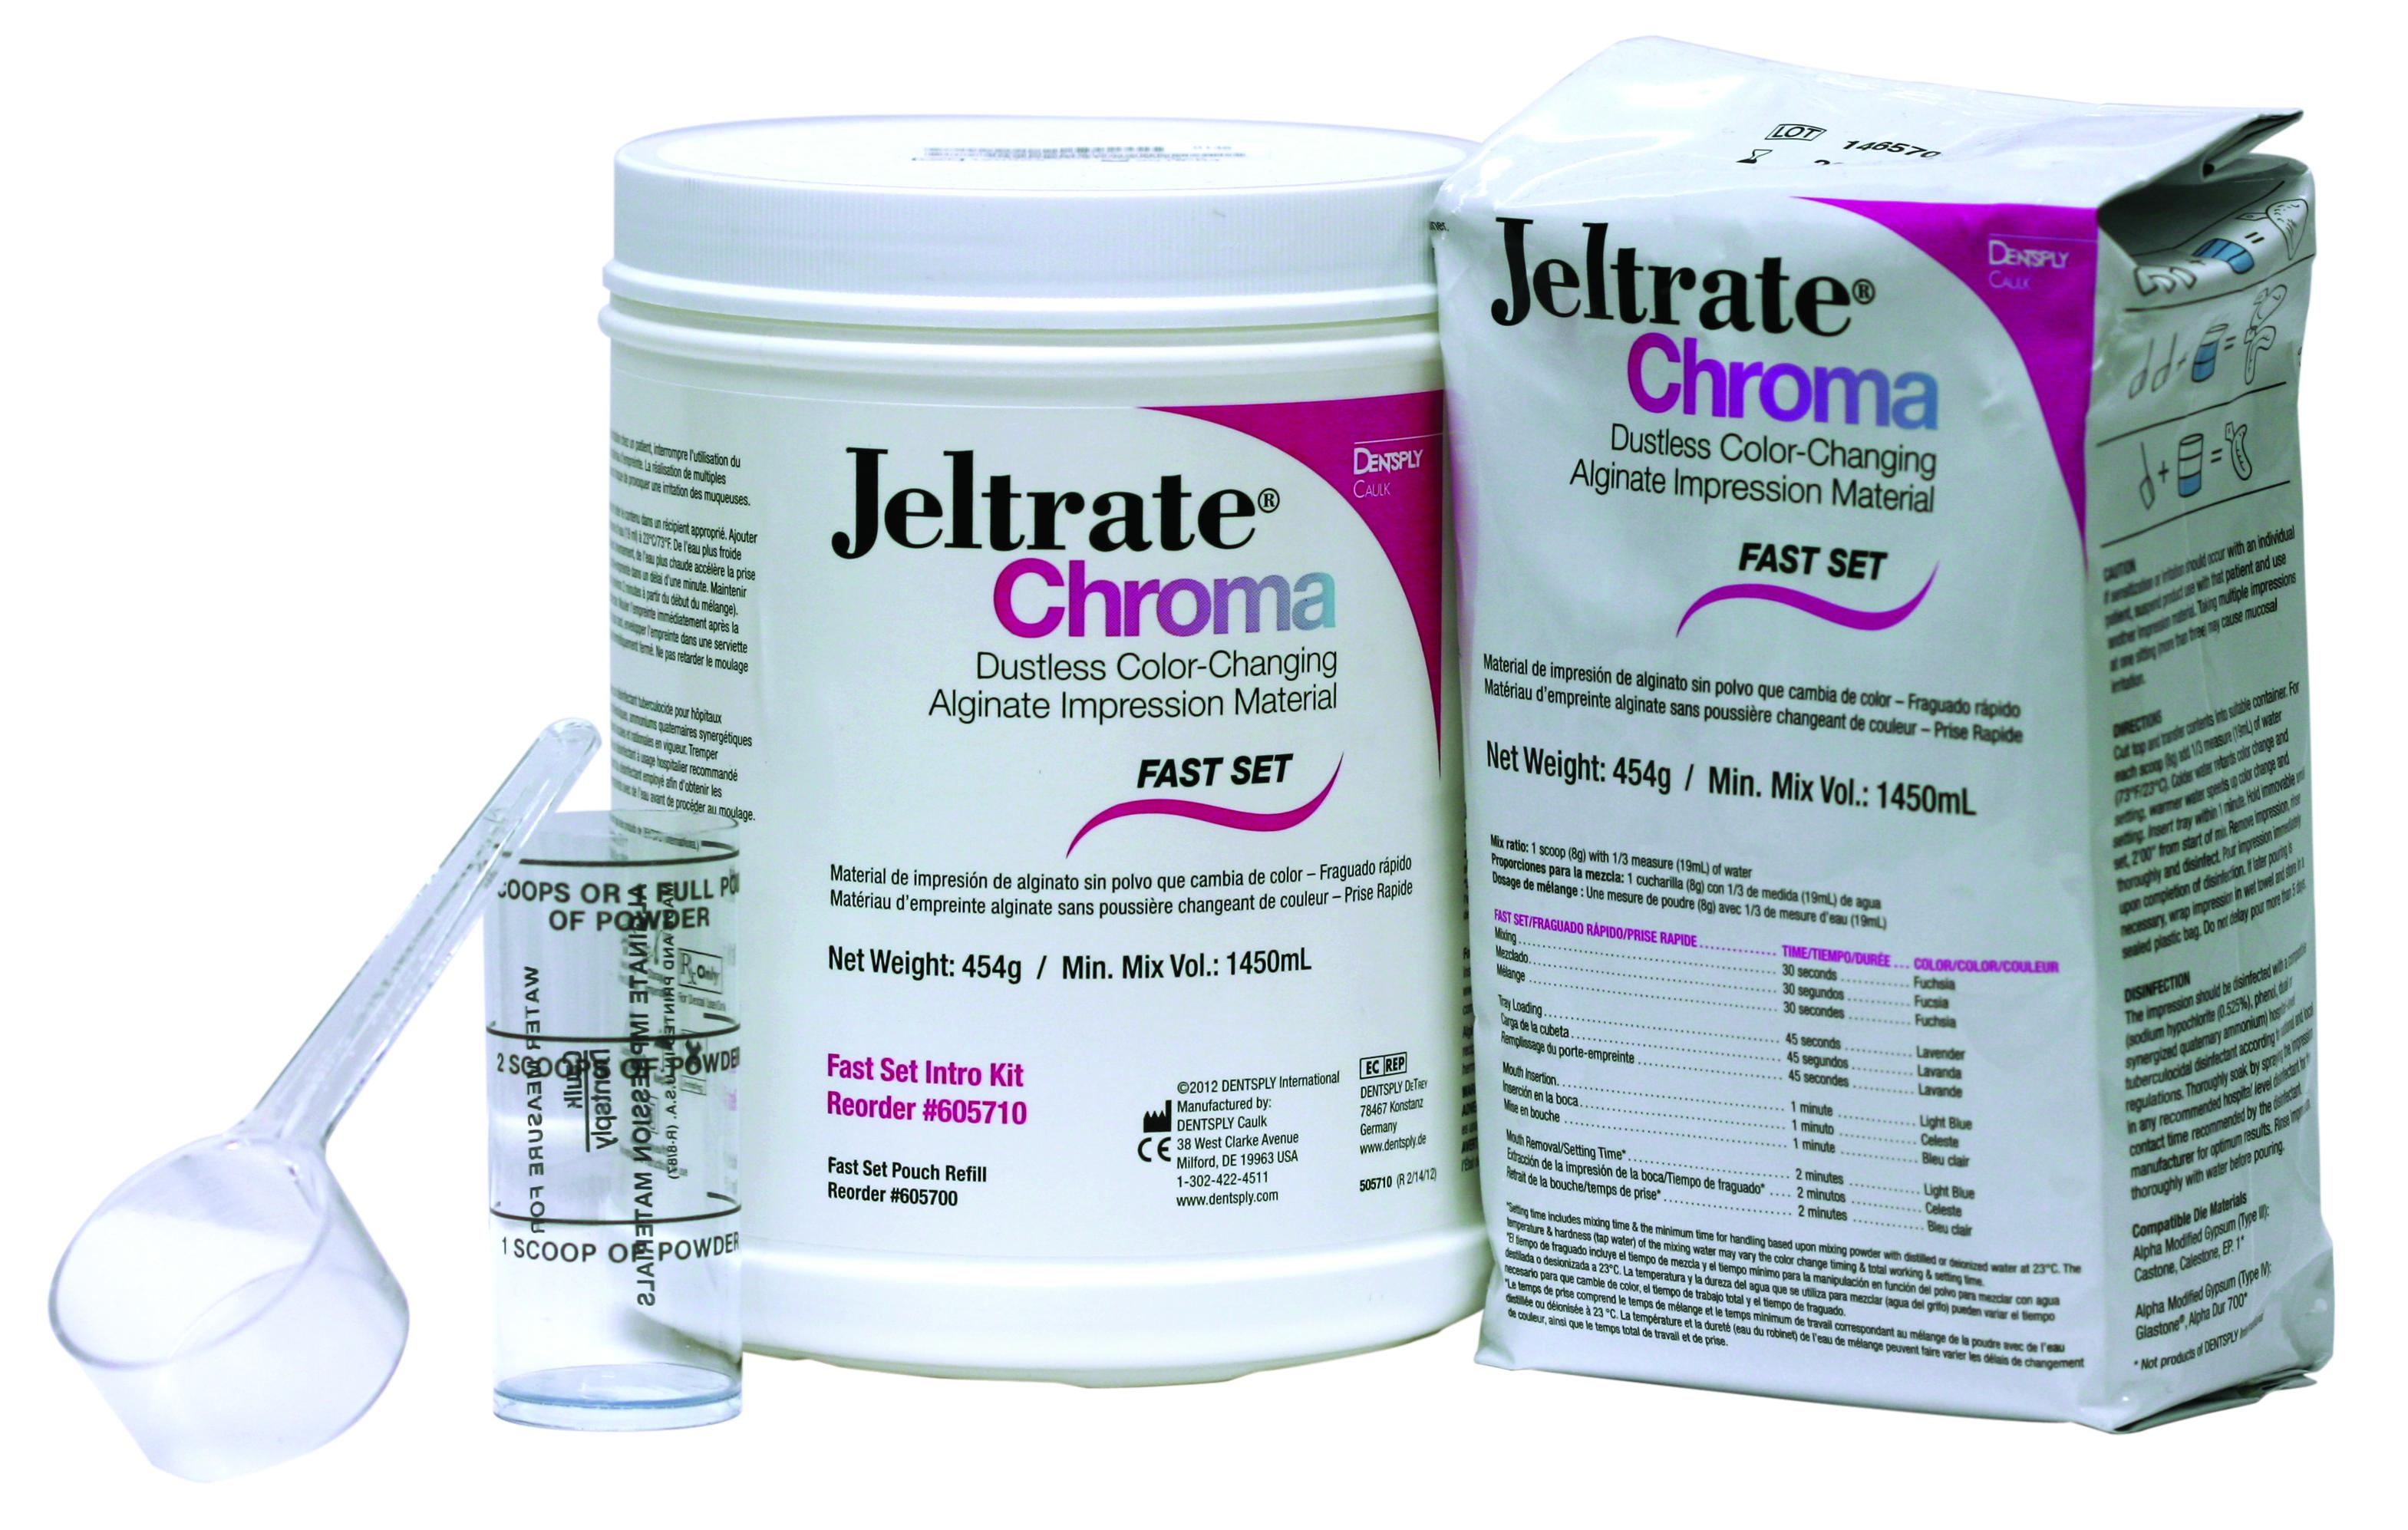 Jeltrate Chroma